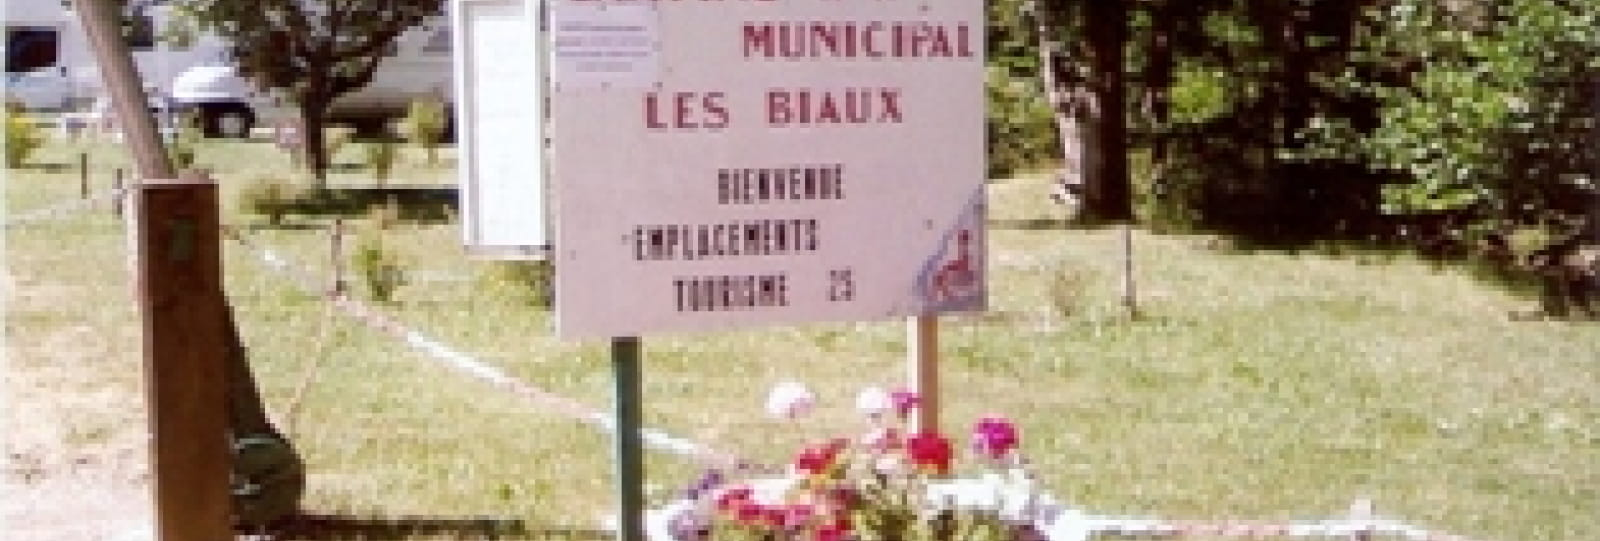 Camping municipal Les Biaux